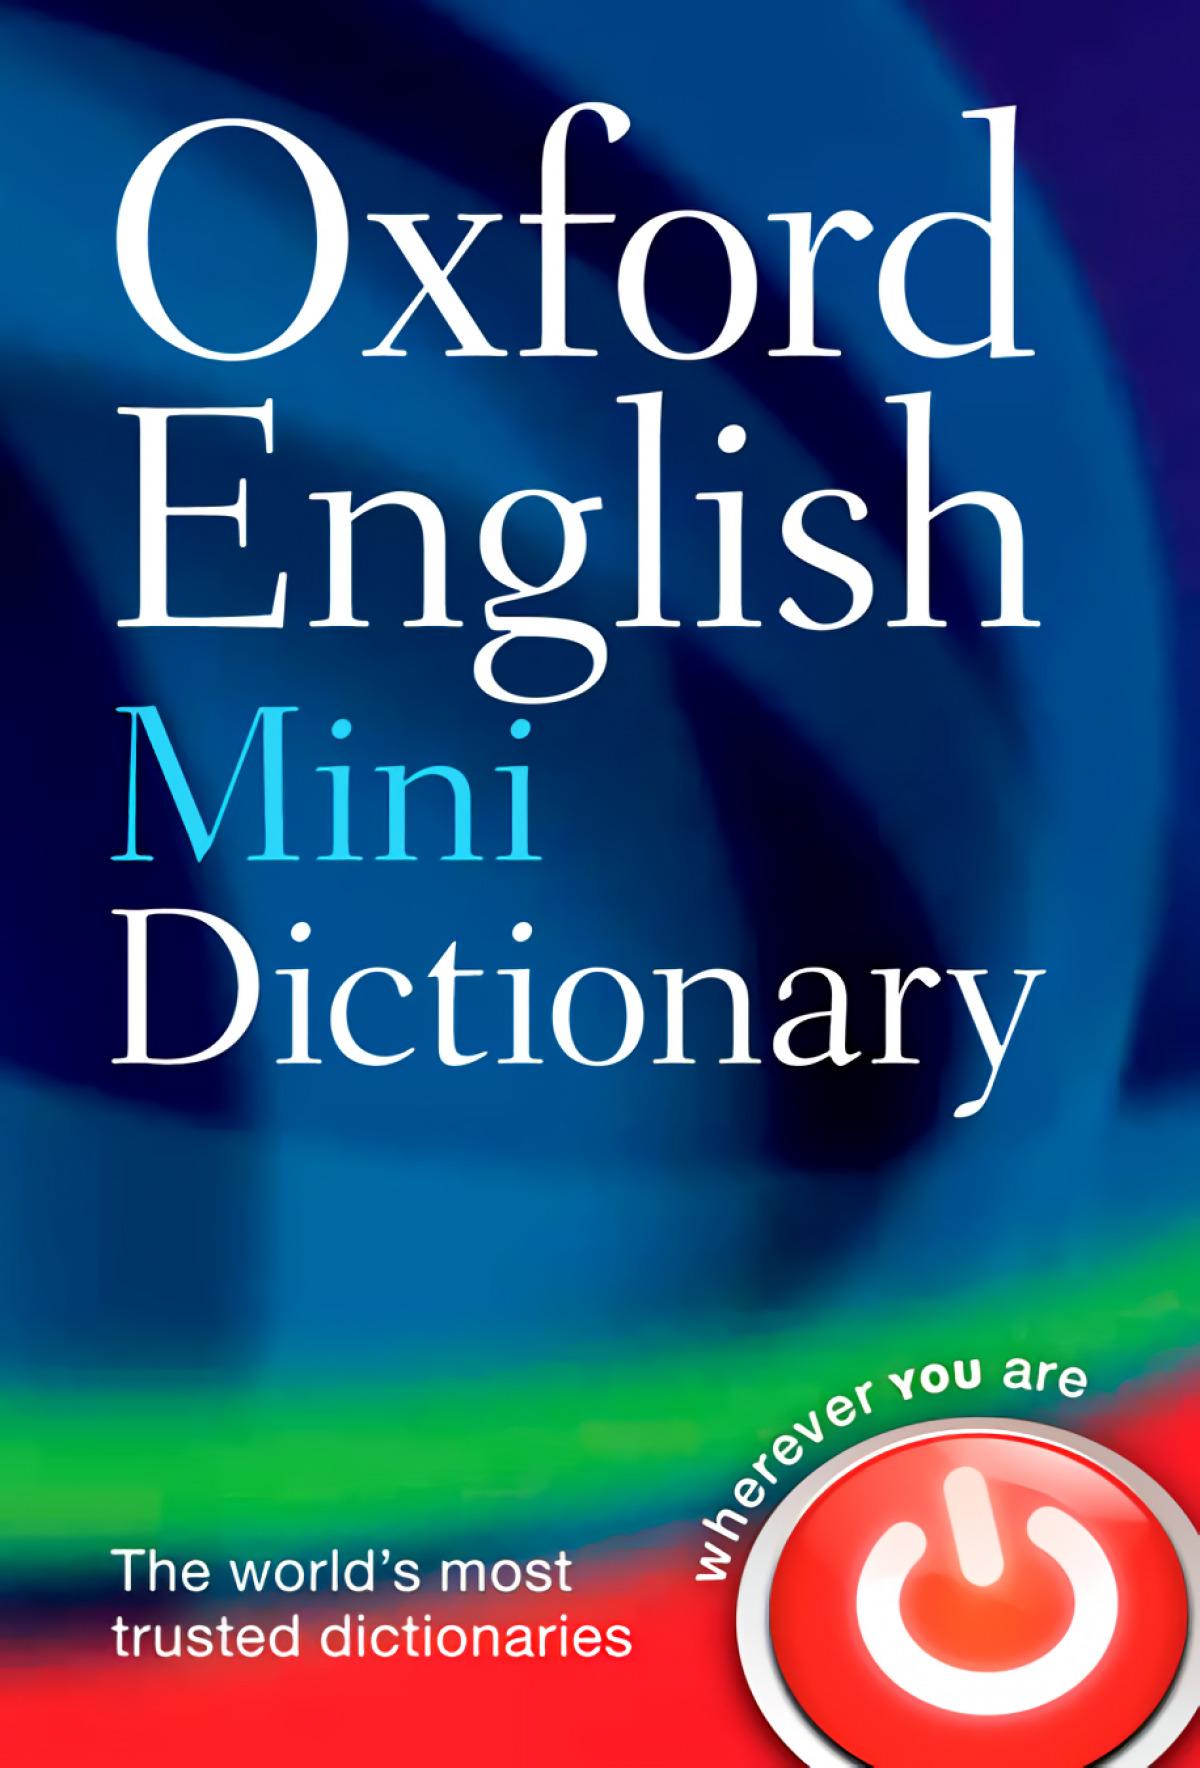 Oxford English Minidictionary: 8th Edition 9780199640966